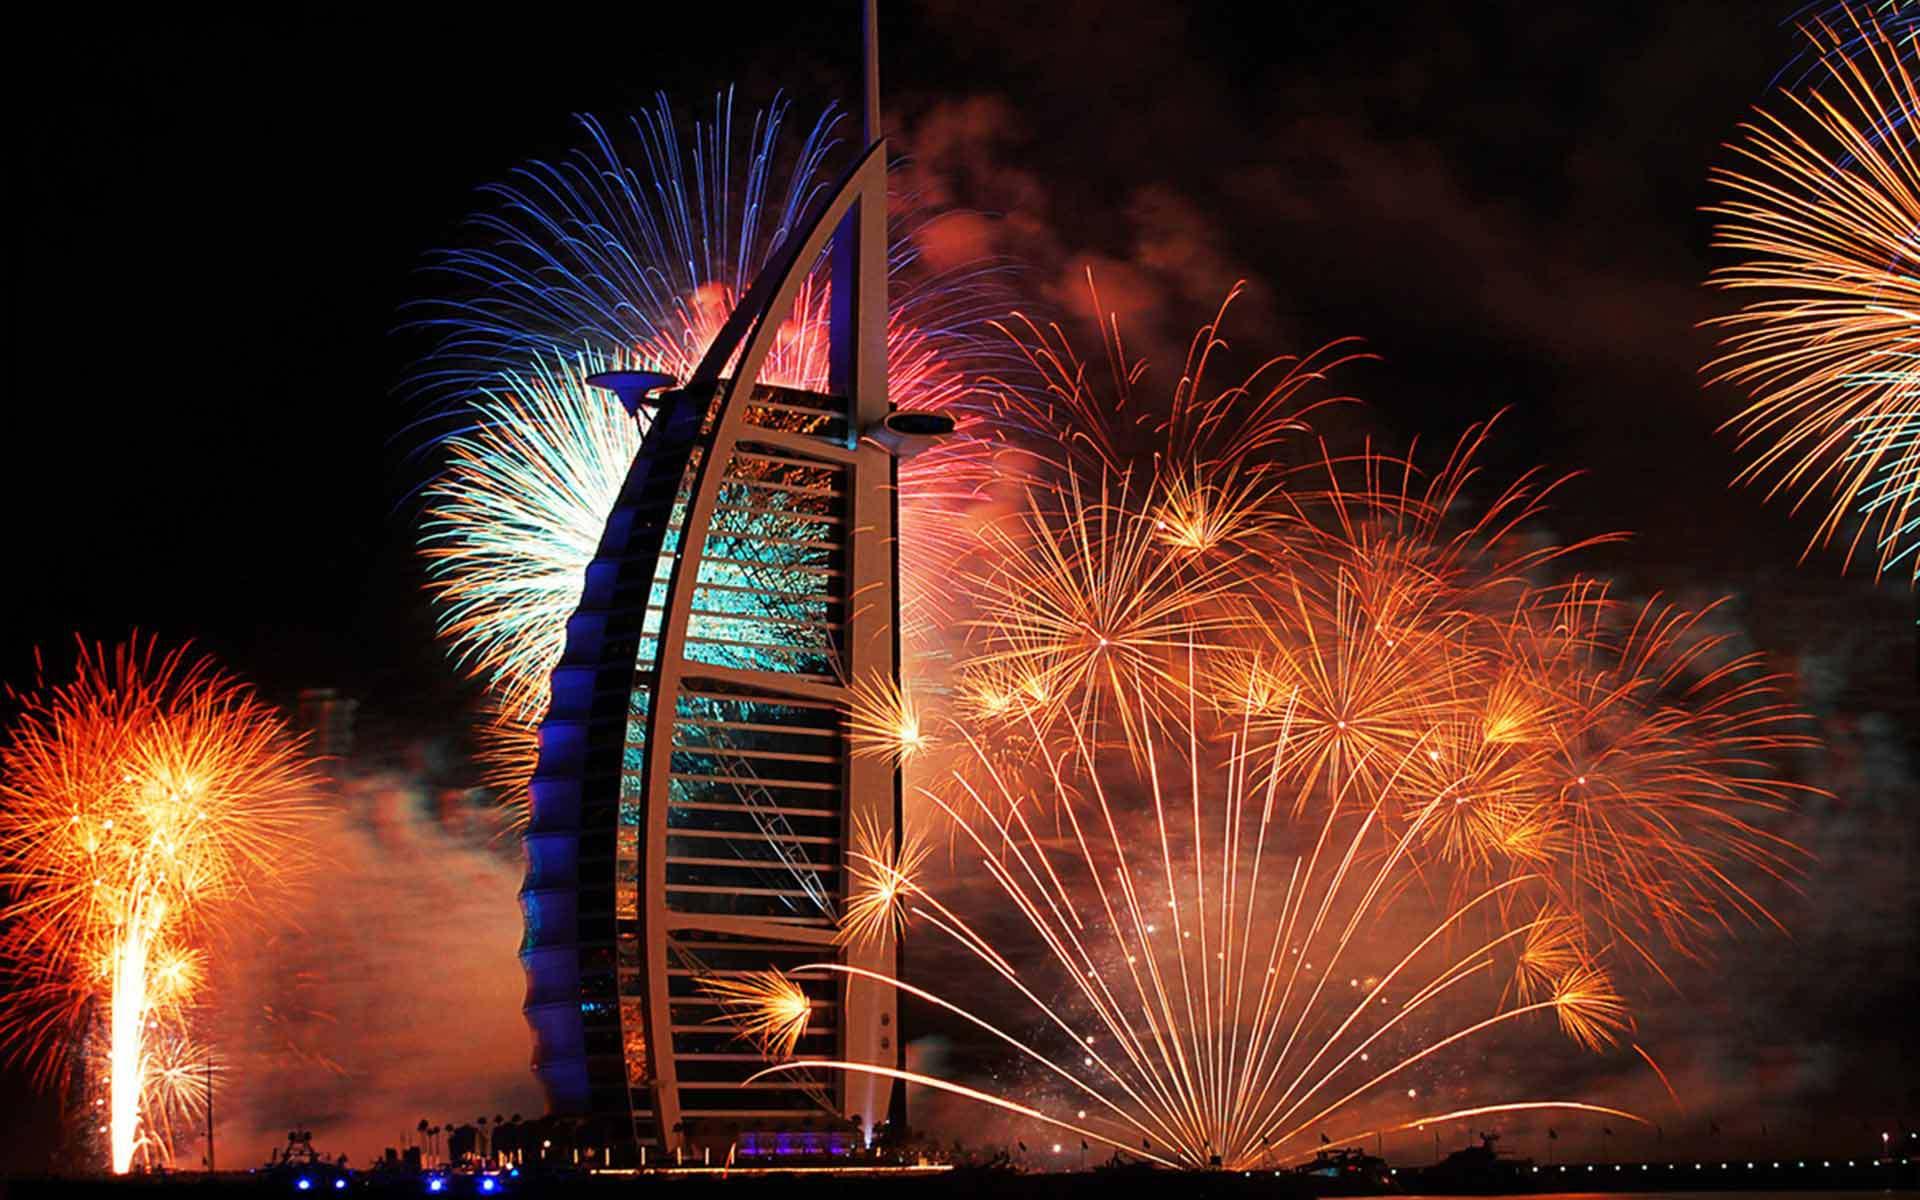 Burj Al Arab Wallpapers Images Photos Pictures Backgrounds